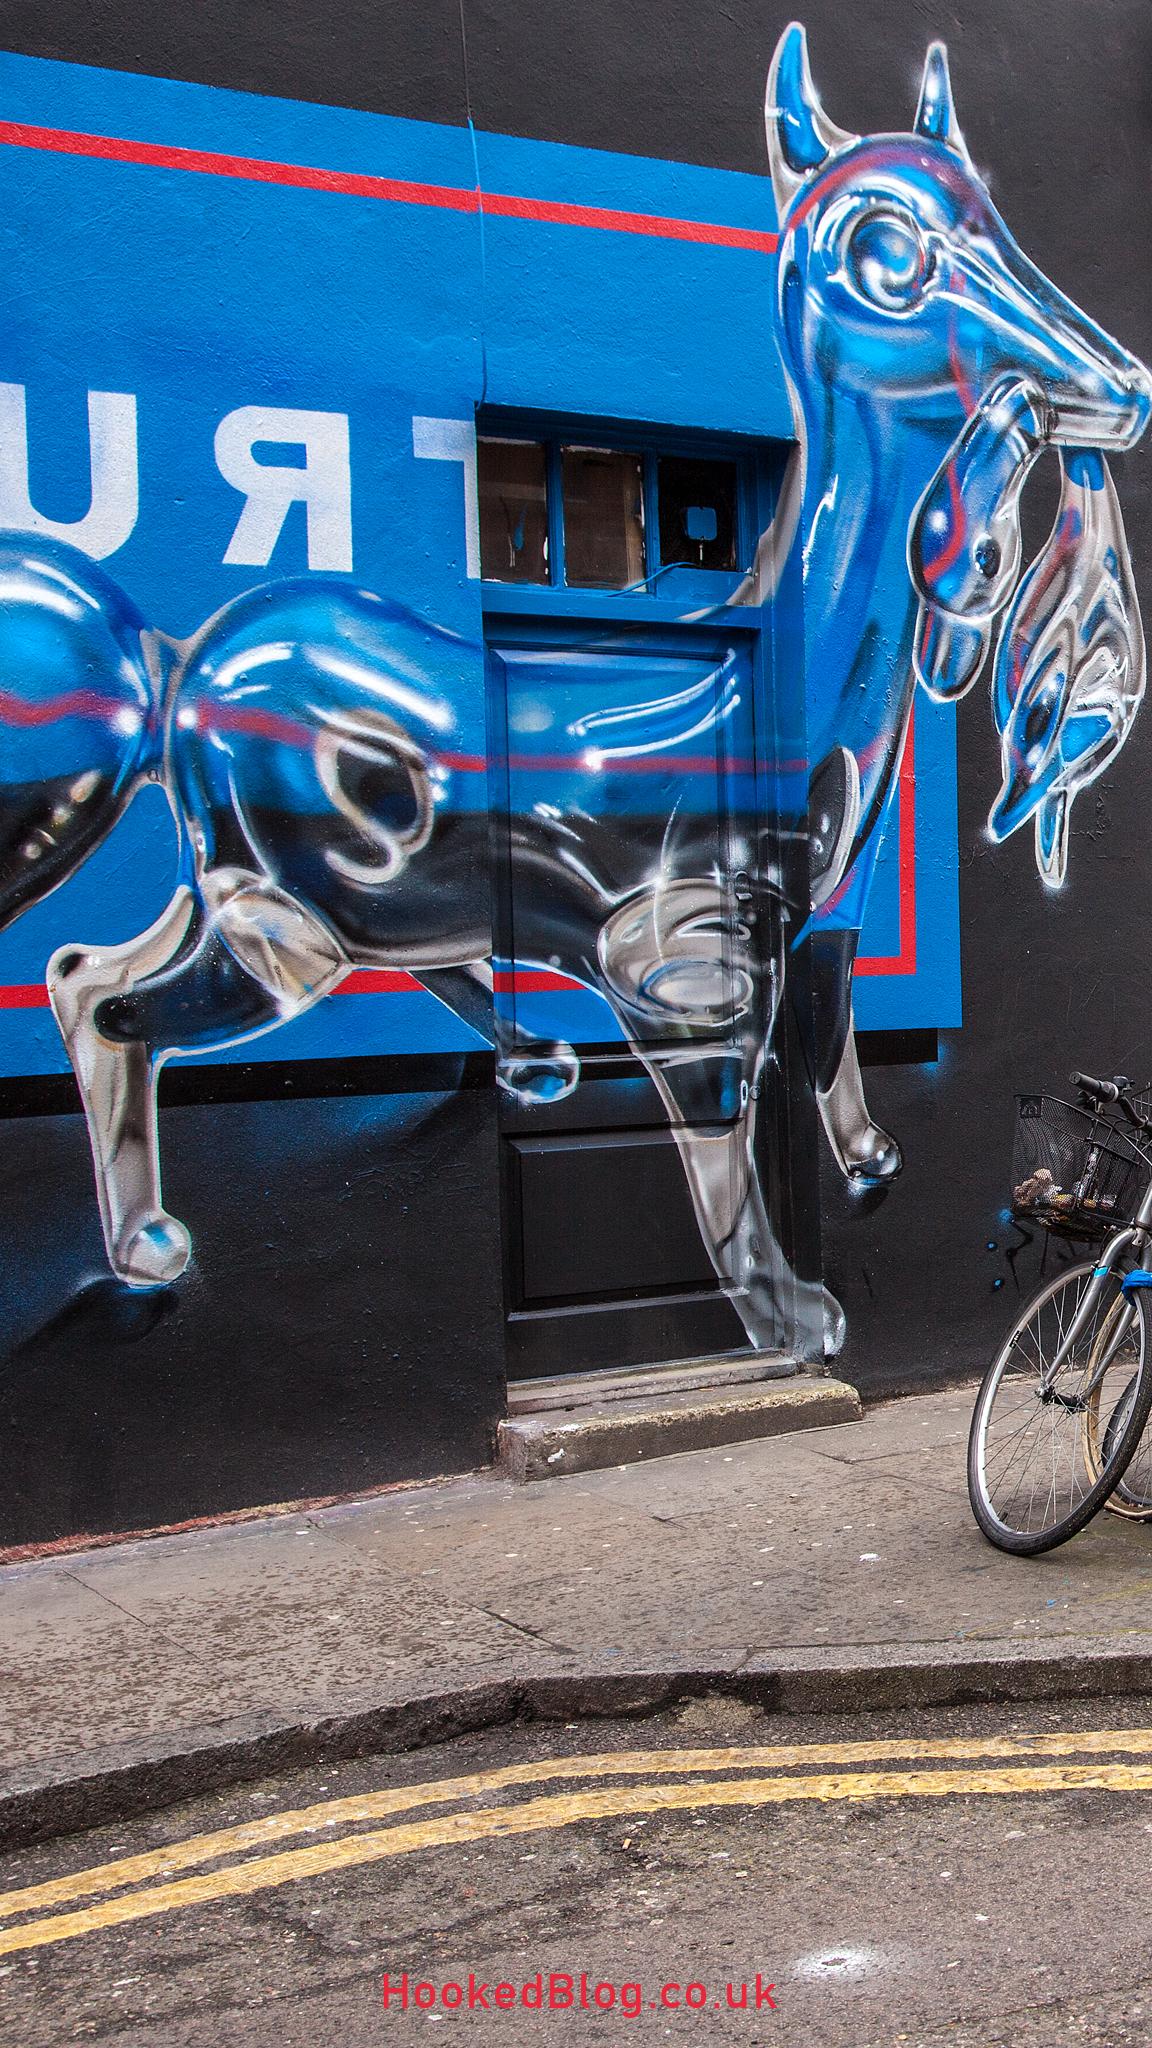 Fanakapan, London Street Art Mural on Hanbury Street, London. Photo ©Hookedblog / Mark Rigney